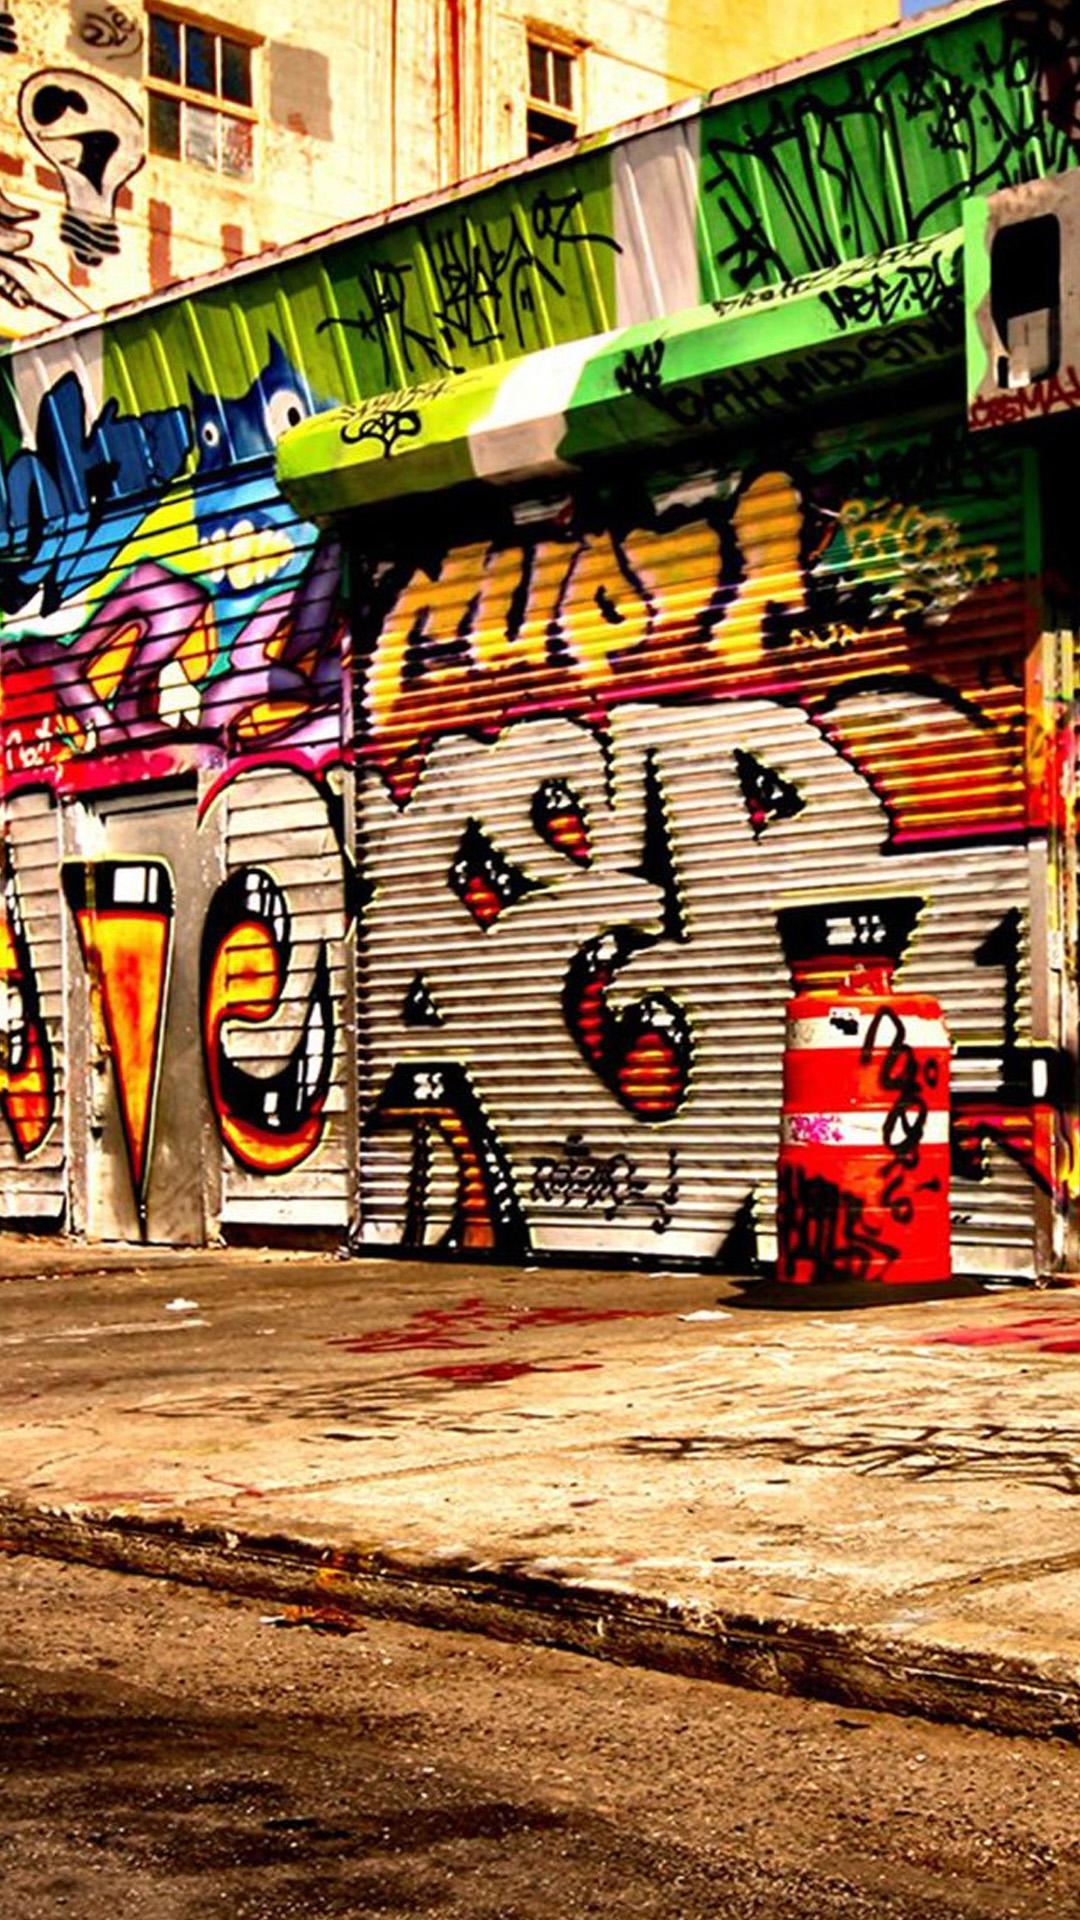 Unduh 300+ Wallpaper Android Graffiti HD